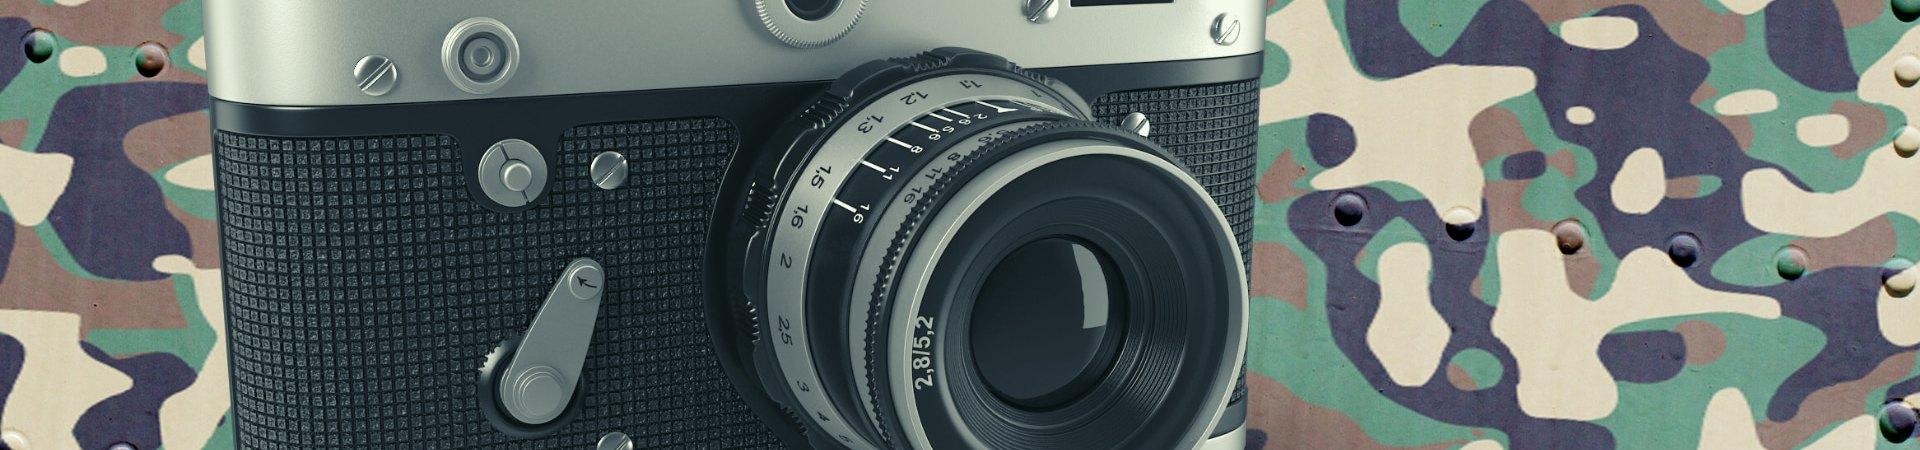 vintage camera on camo background